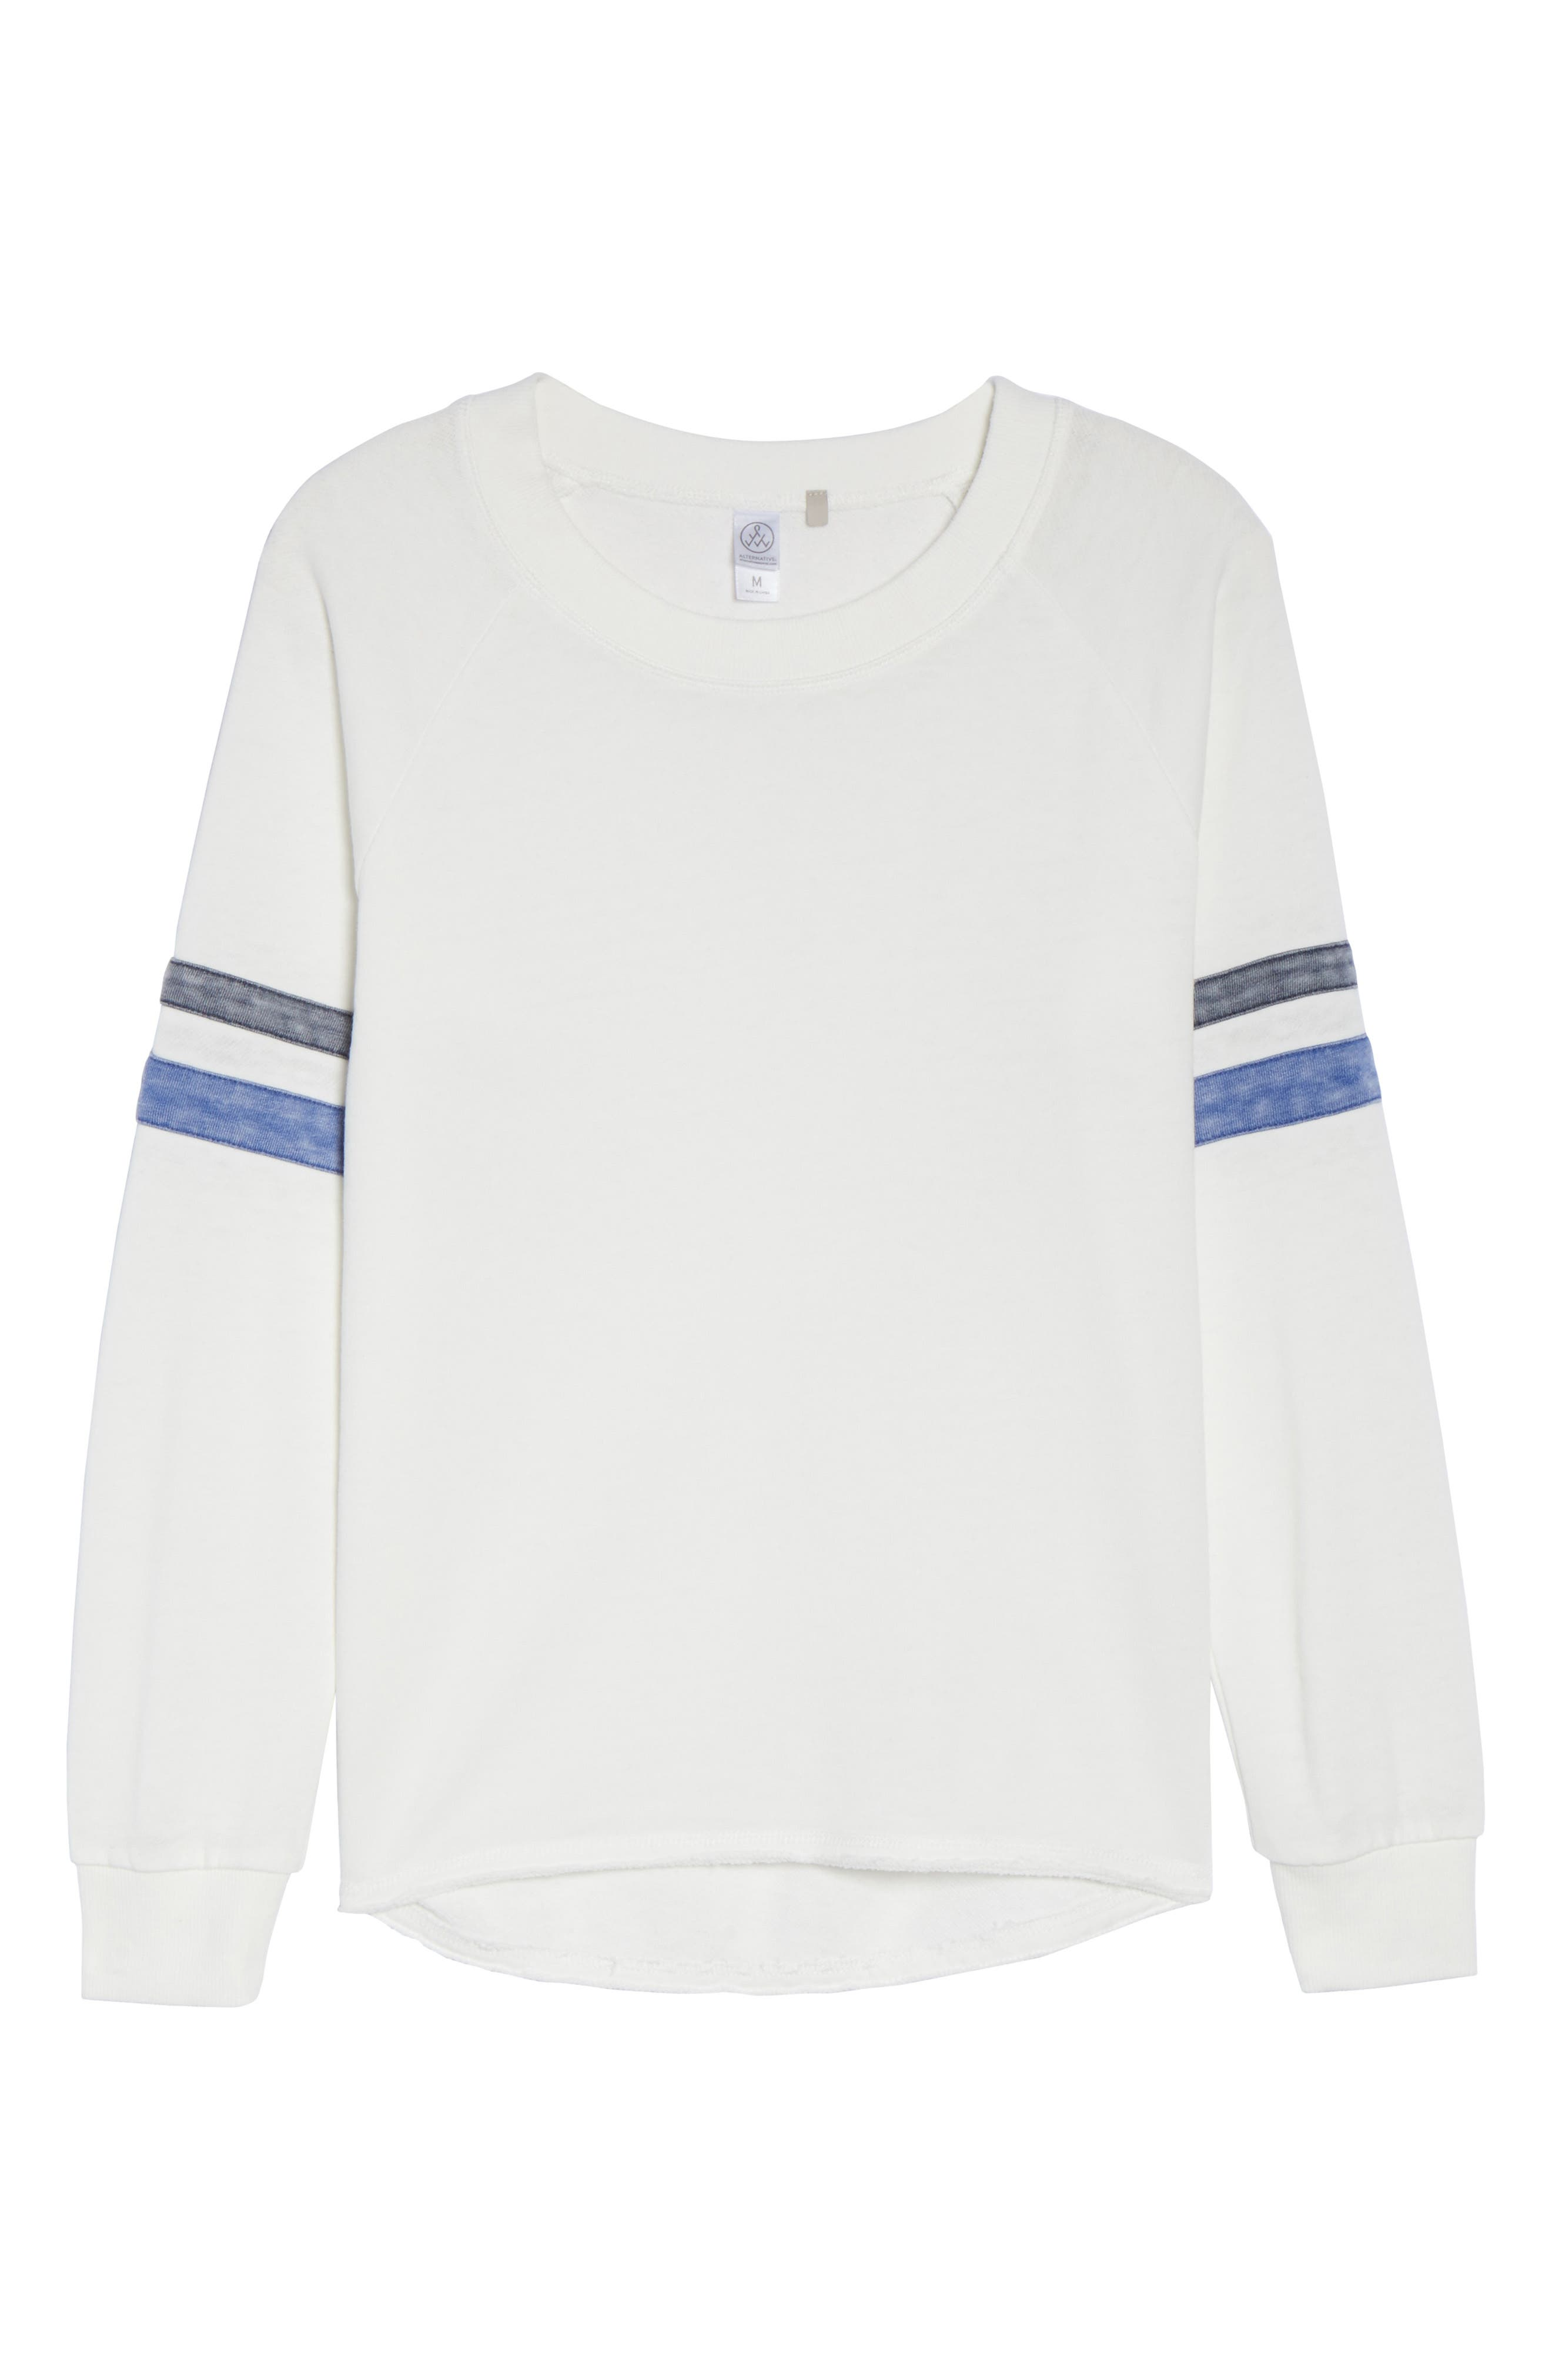 Lazy Day Sweatshirt,                             Alternate thumbnail 12, color,